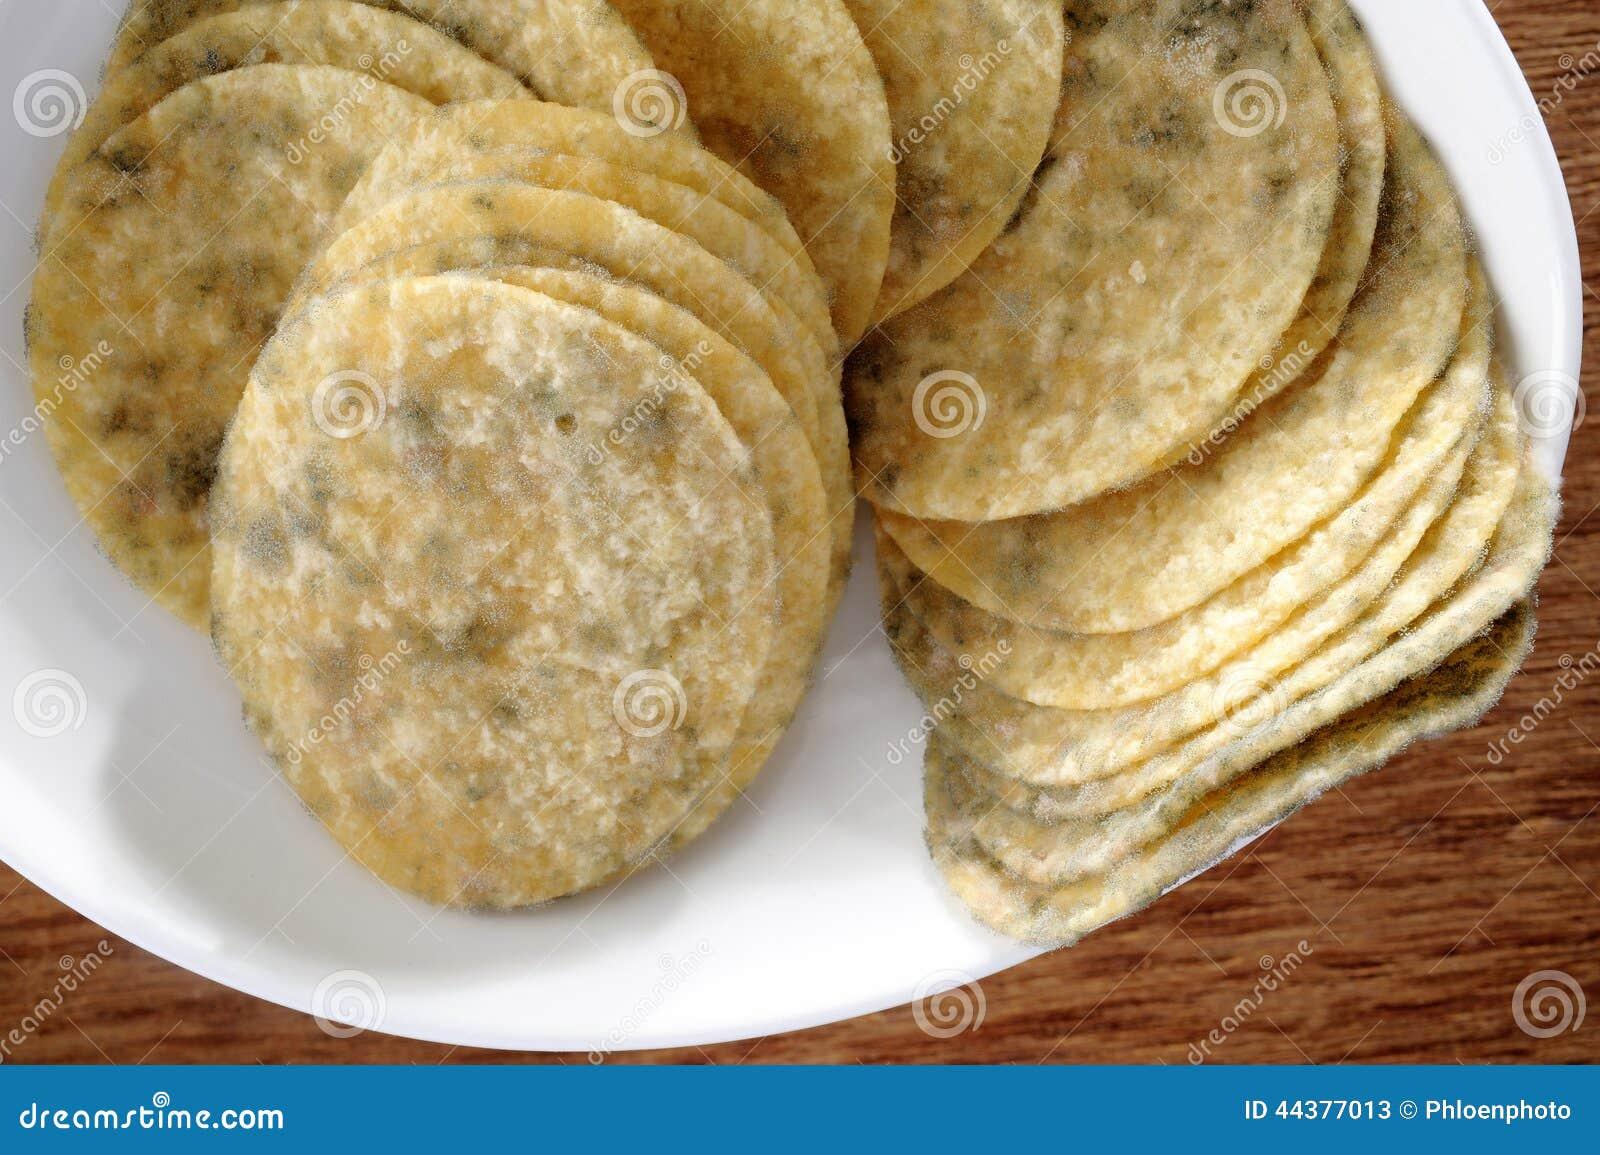 Chocolate Potatoes Chips